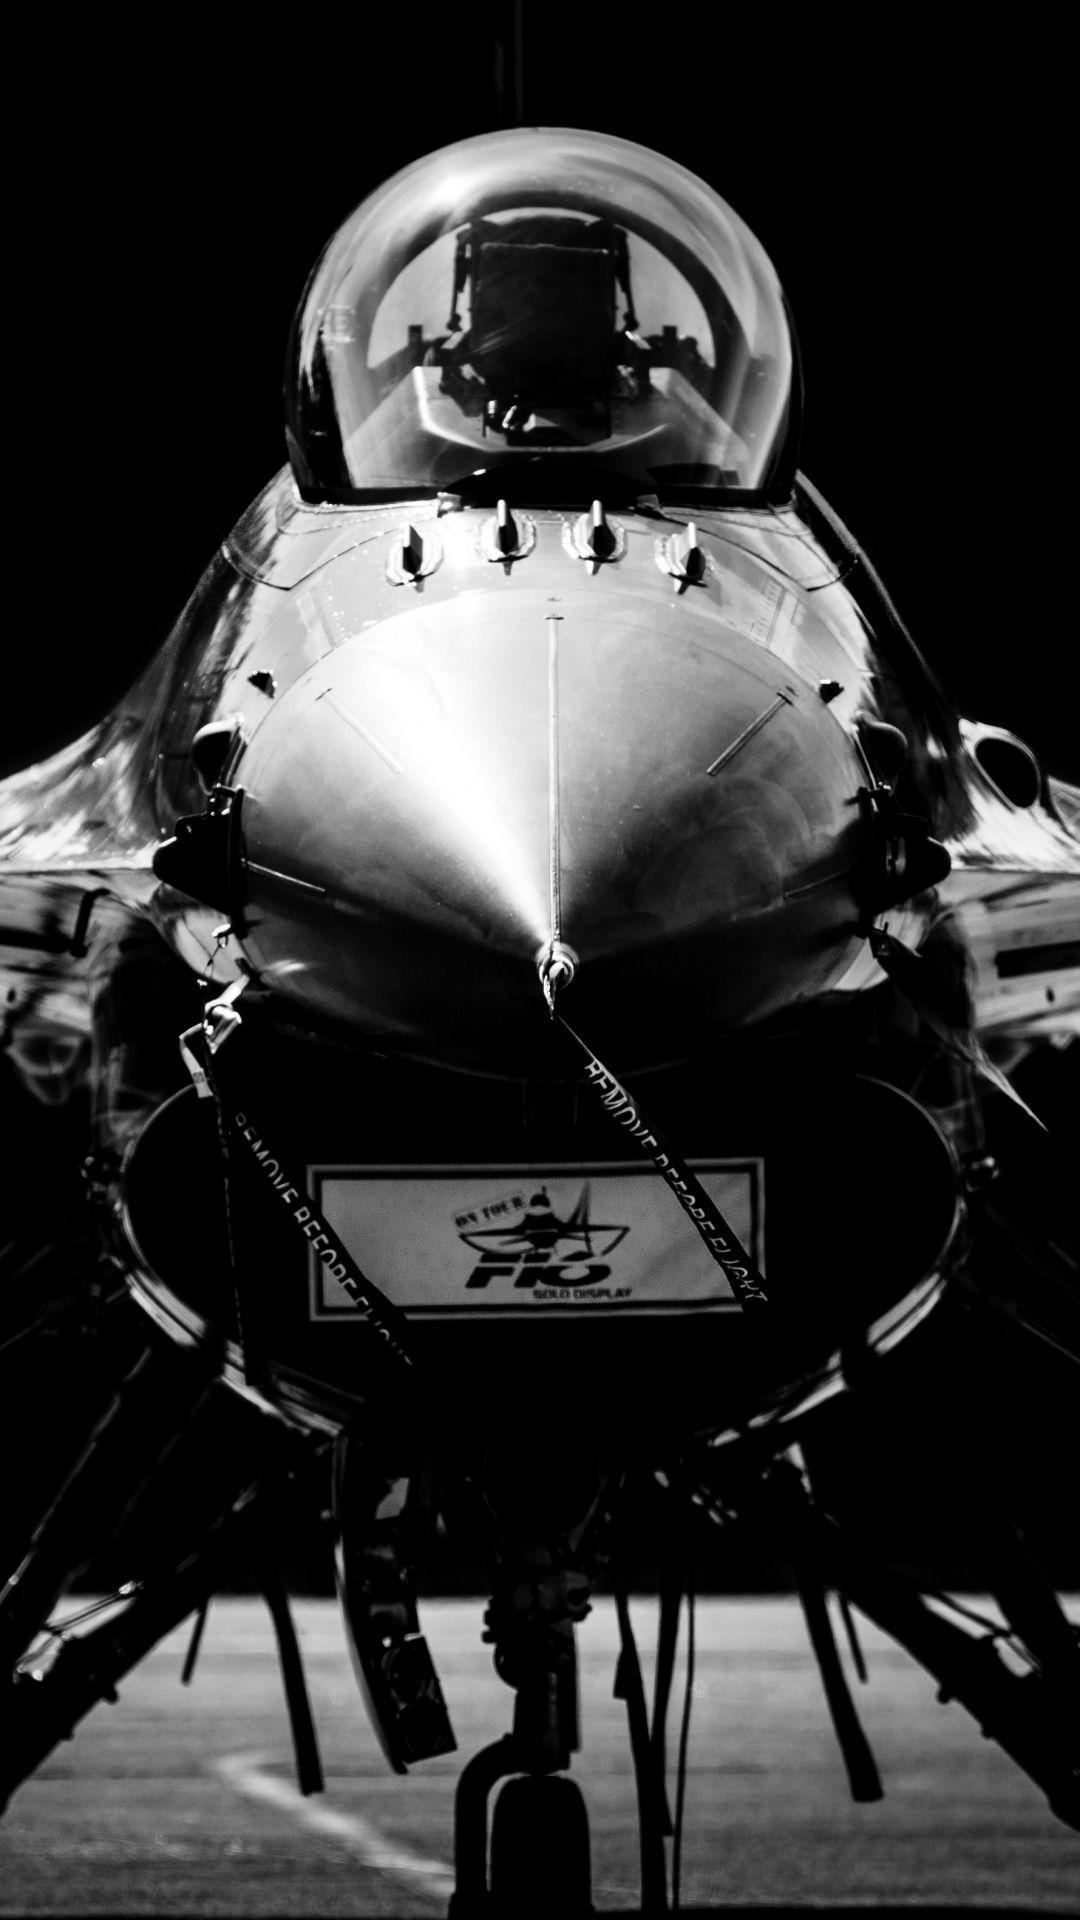 Military/General Dynamics F 21 Fighting Falcon 21x21 ...